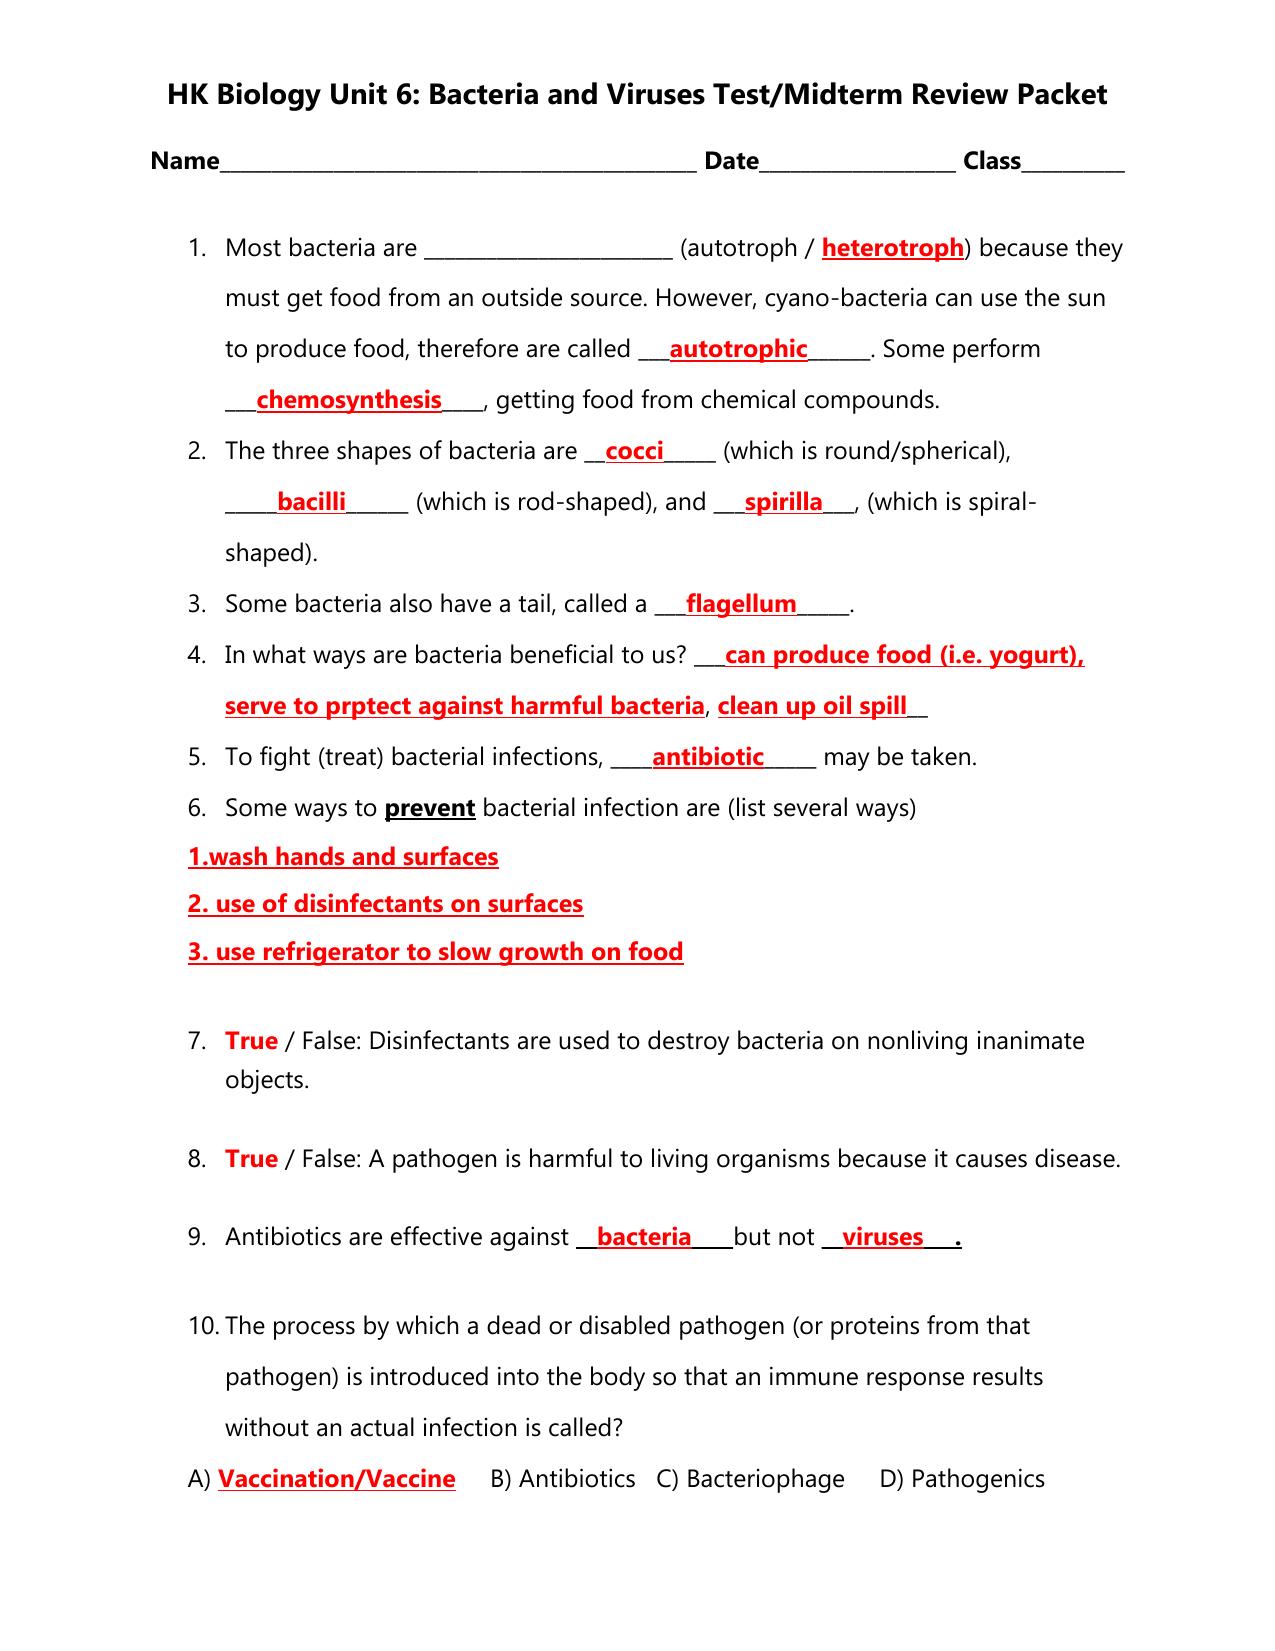 Characteristics Of Bacteria Worksheet Answers